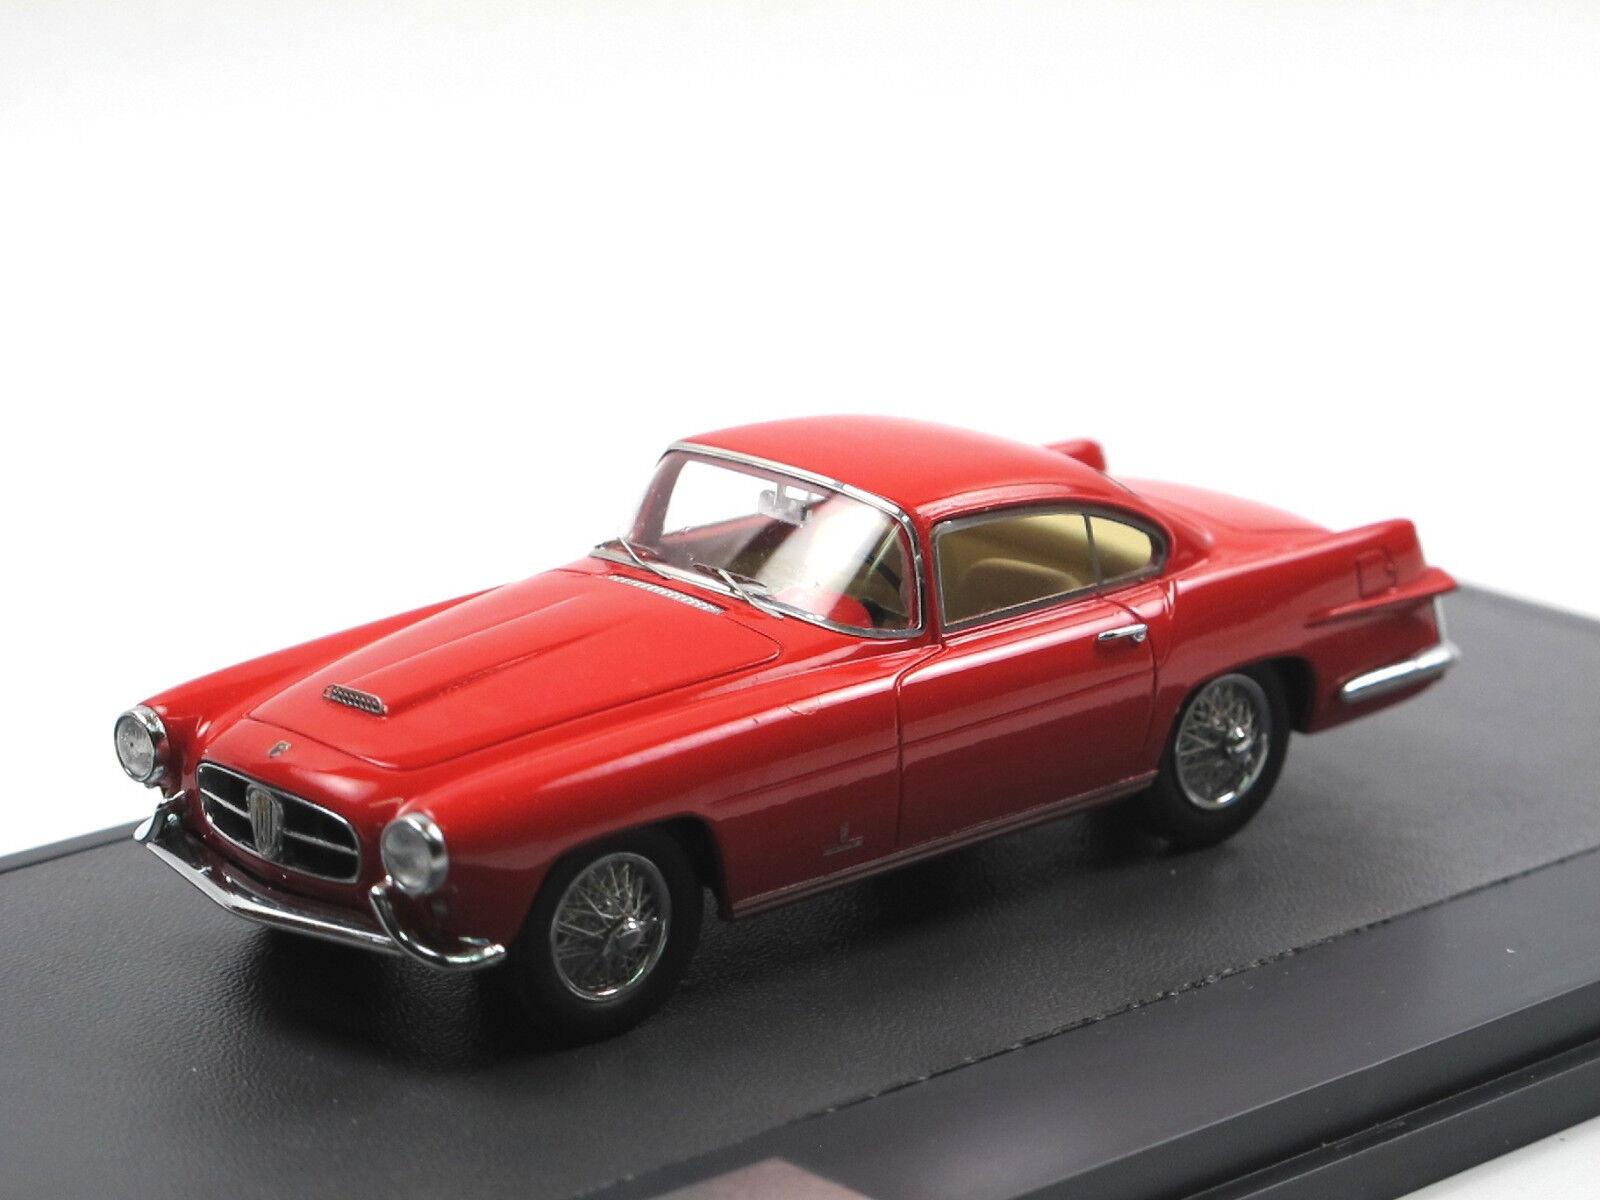 MATRIX SCALE MODELS - 1955 JAGUAR xk140 Coupe by Ghia rouge 1 43 limited edition